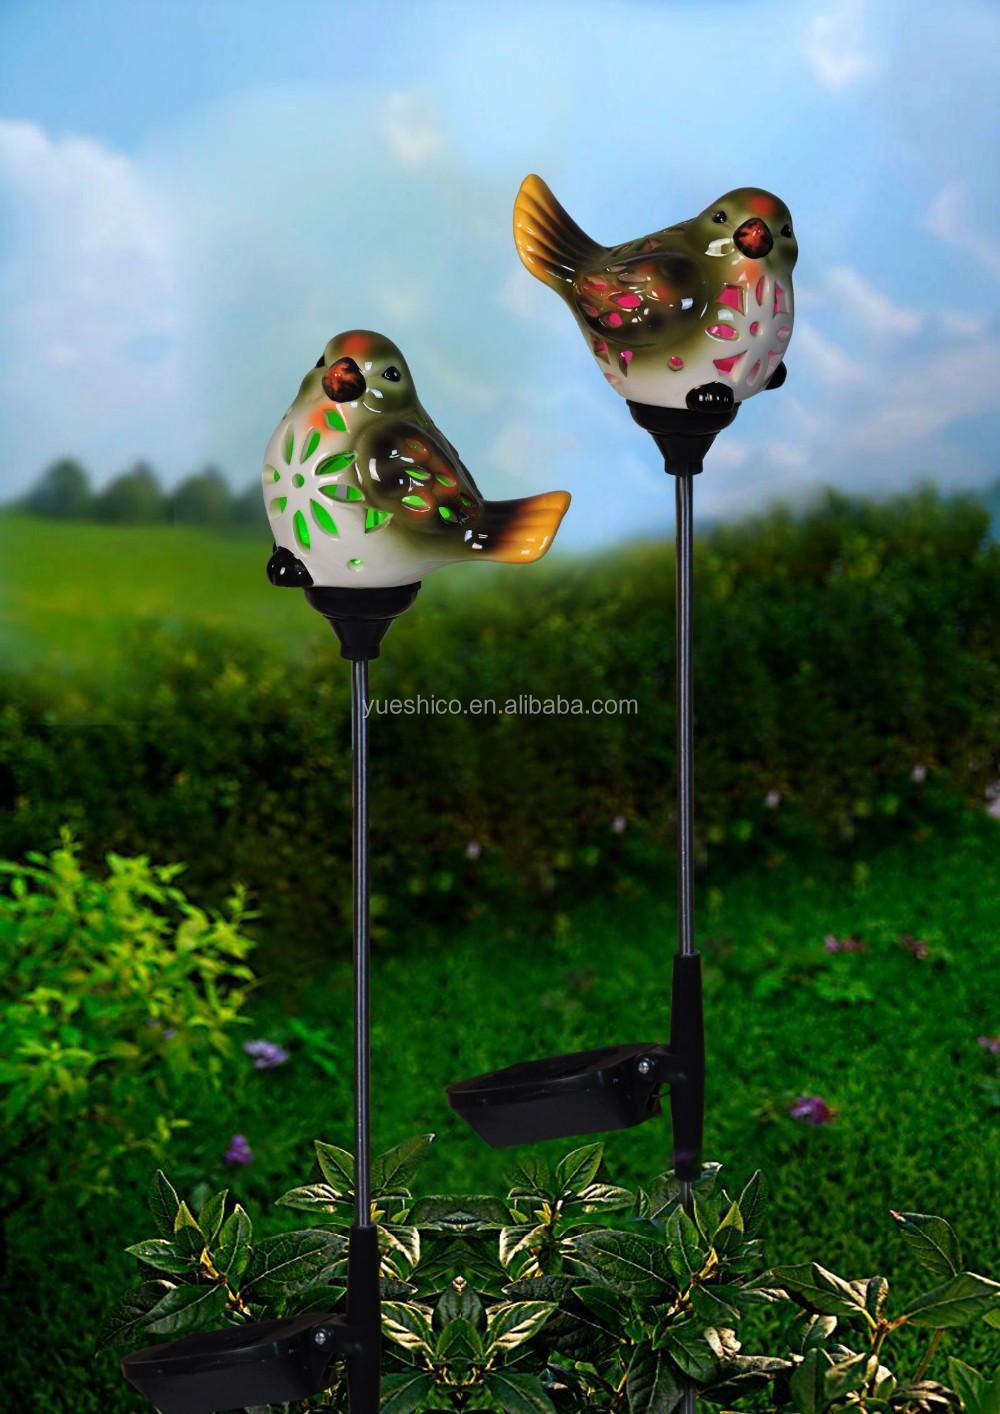 2017 New Bird Solar Garden Light, Ceramic Garden Solar Light, Solar System Garden  Light